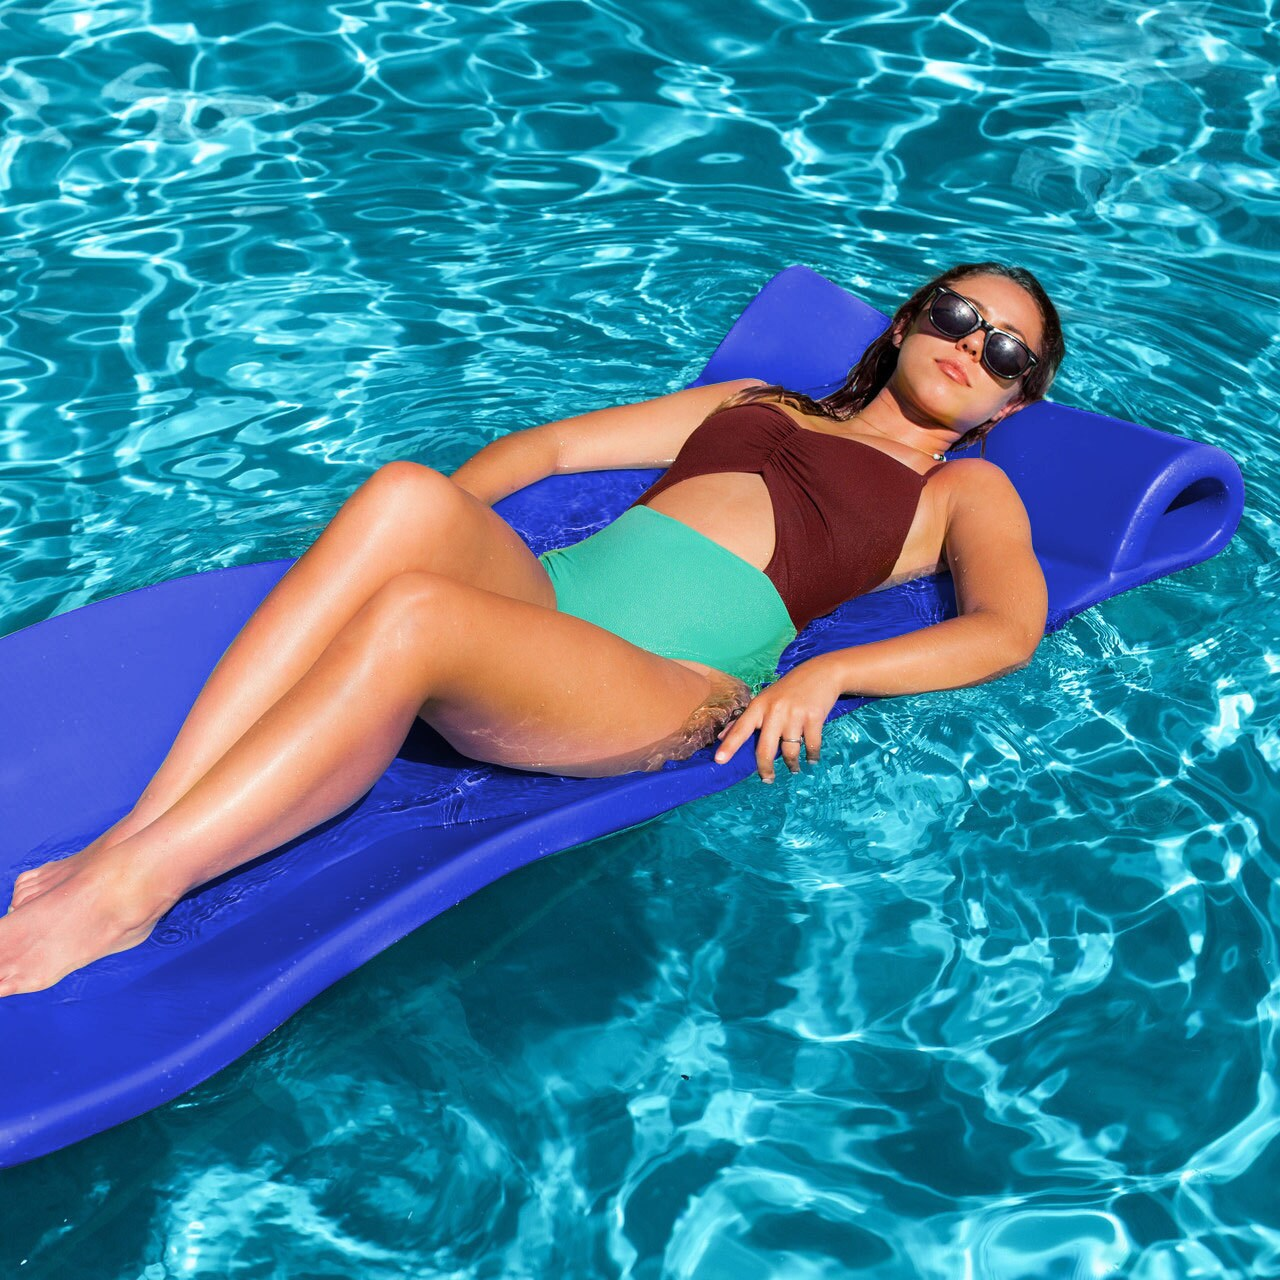 Pool Mate X-Large Foam Mattress Swimming Pool Float 34261956912   eBay